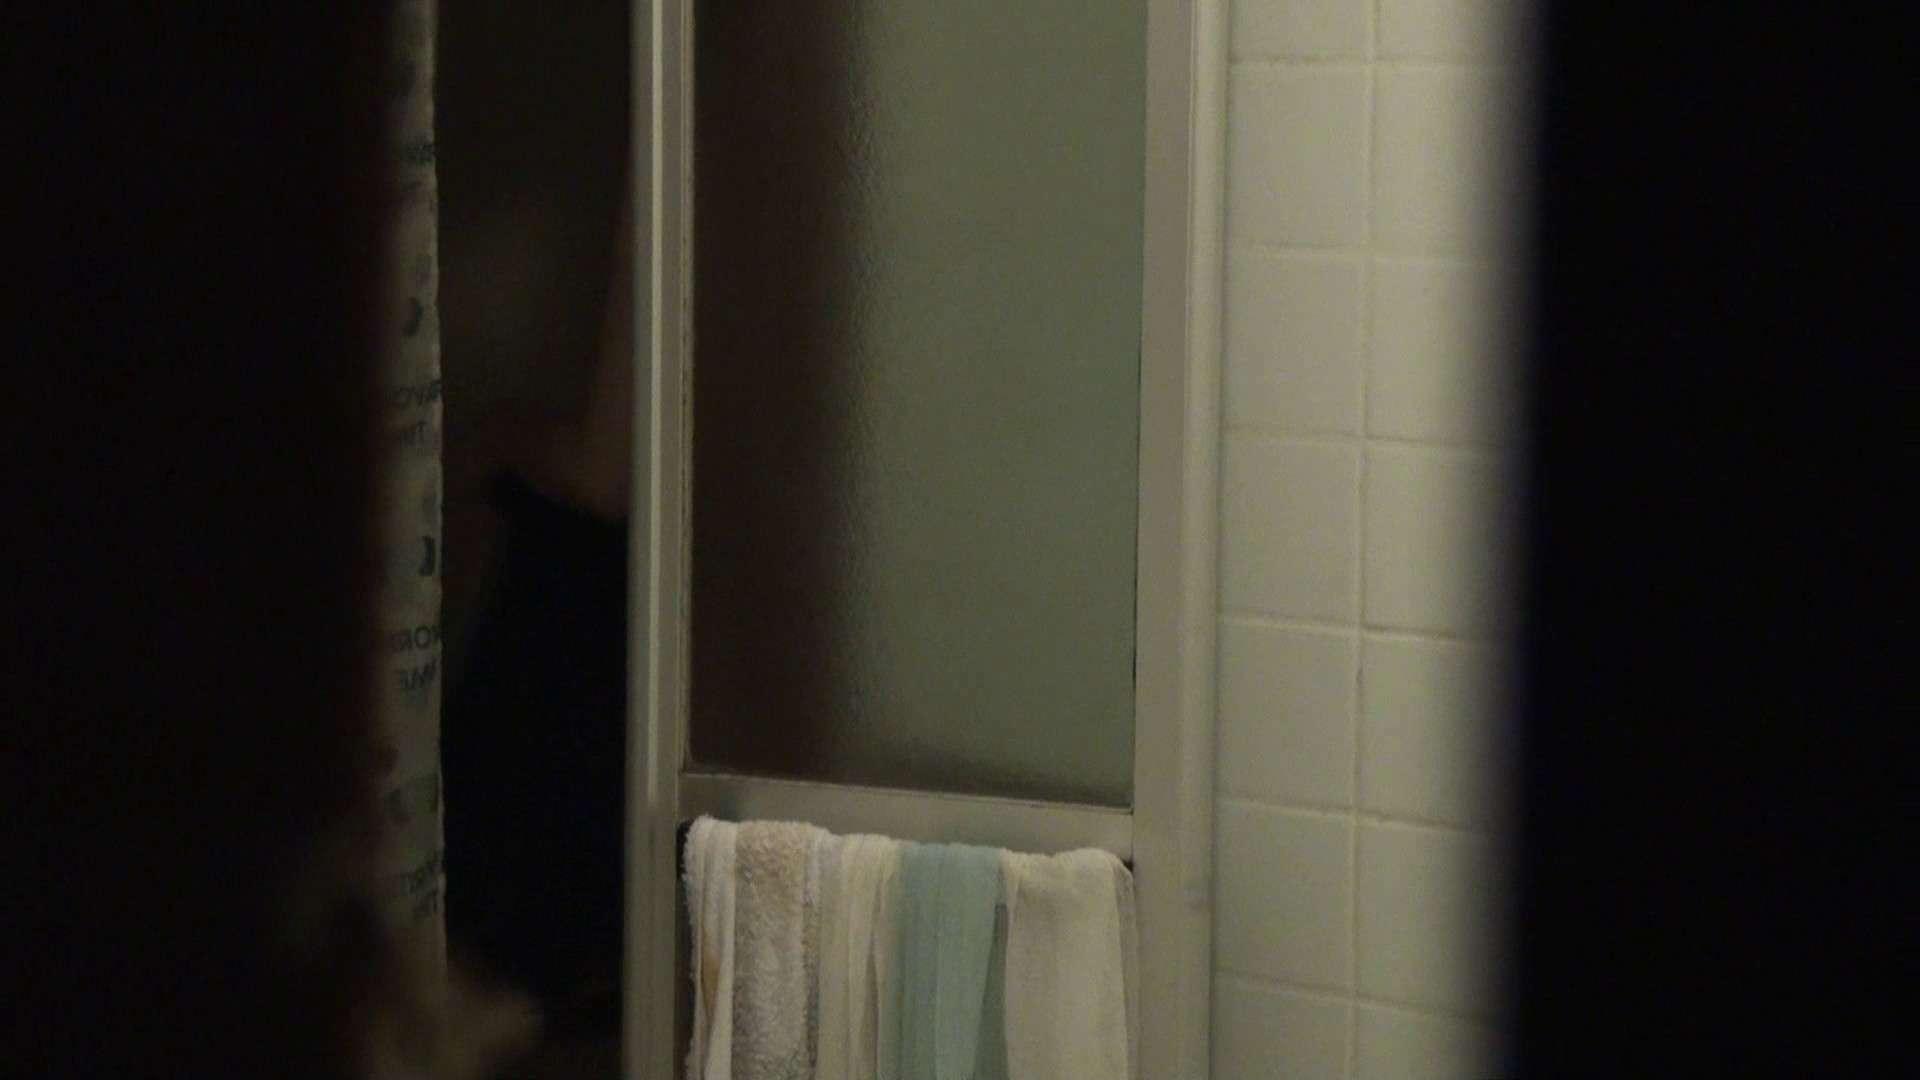 vol.06顔を洗い流す極上お女市さんの裸体をハイビジョンで!風呂上り着替え必見! 美人編 戯れ無修正画像 68画像 14